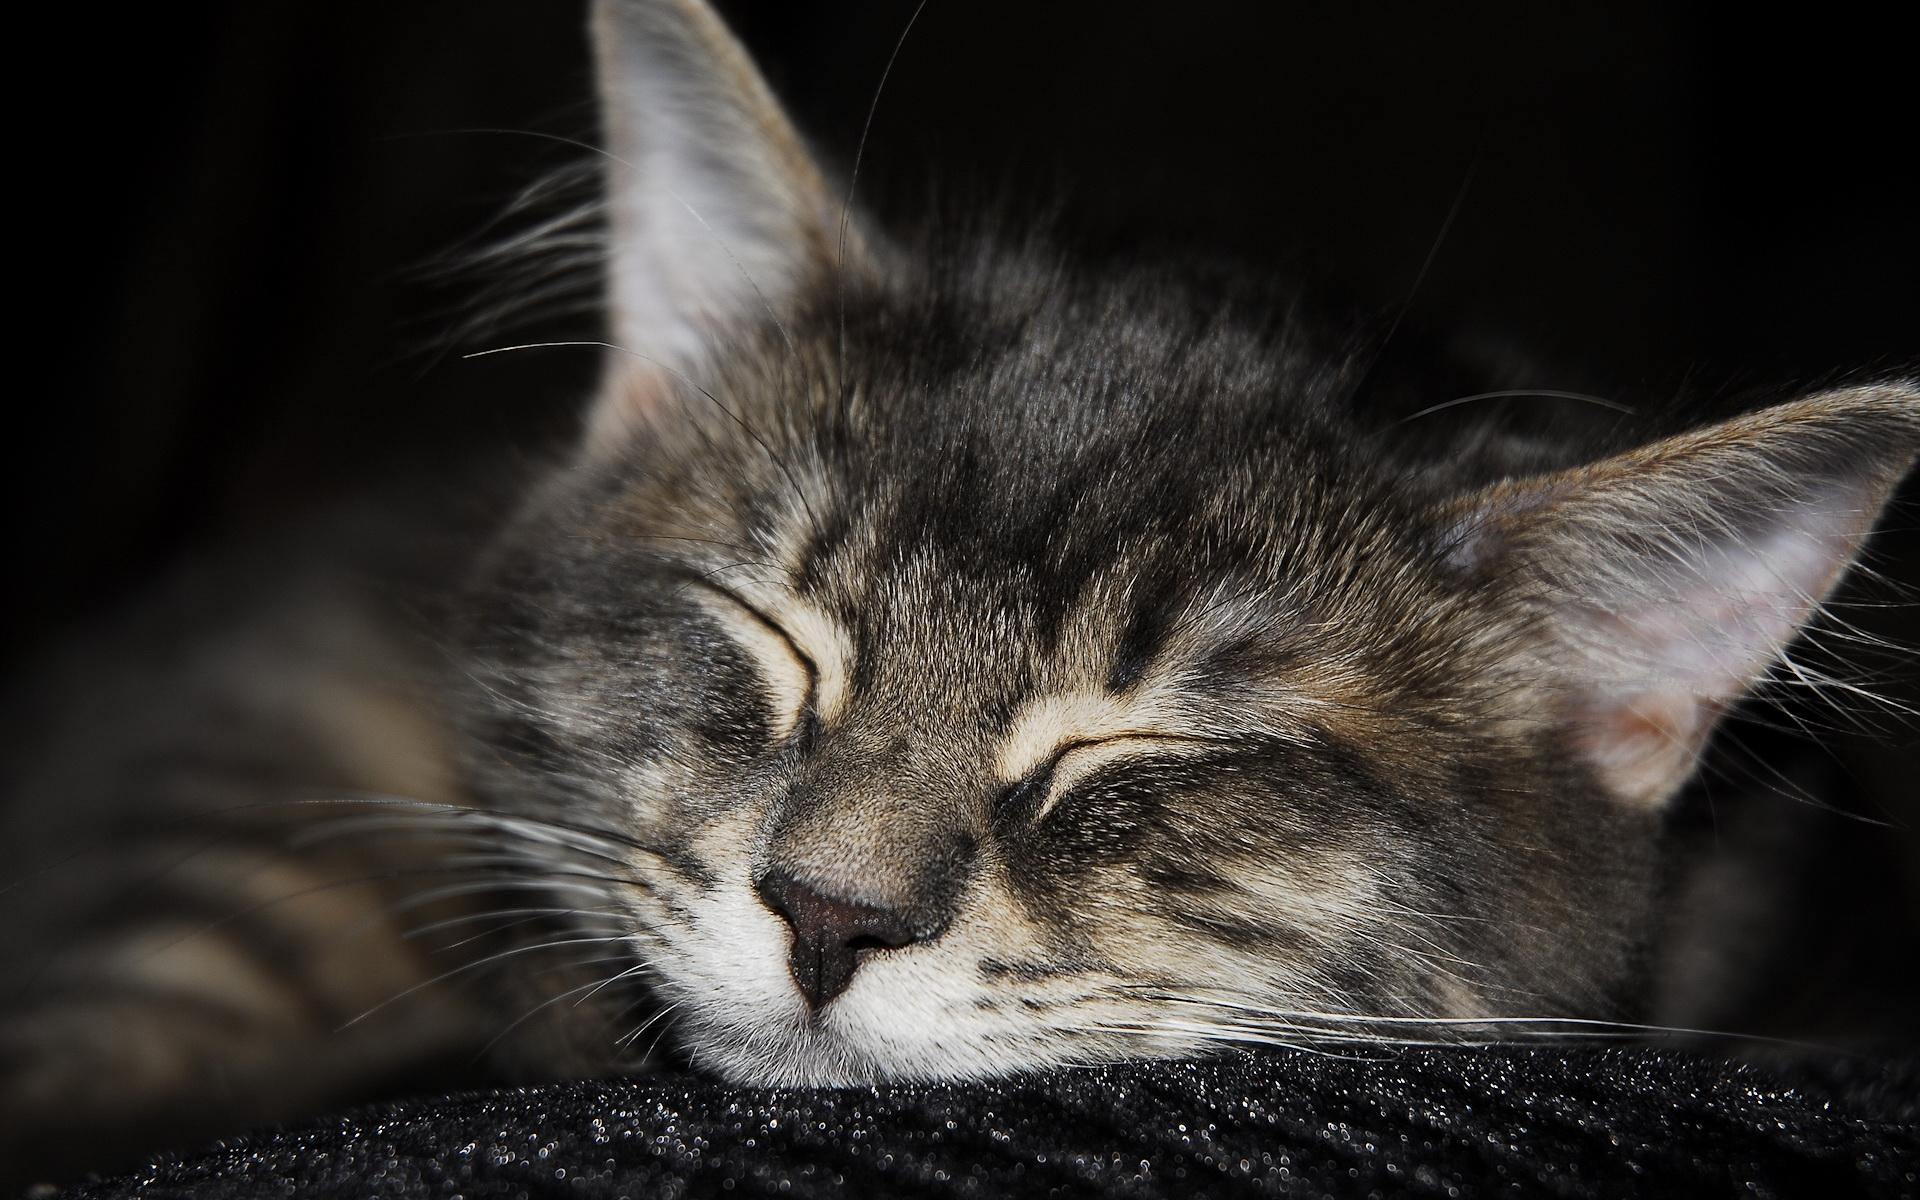 cat_9.jpg